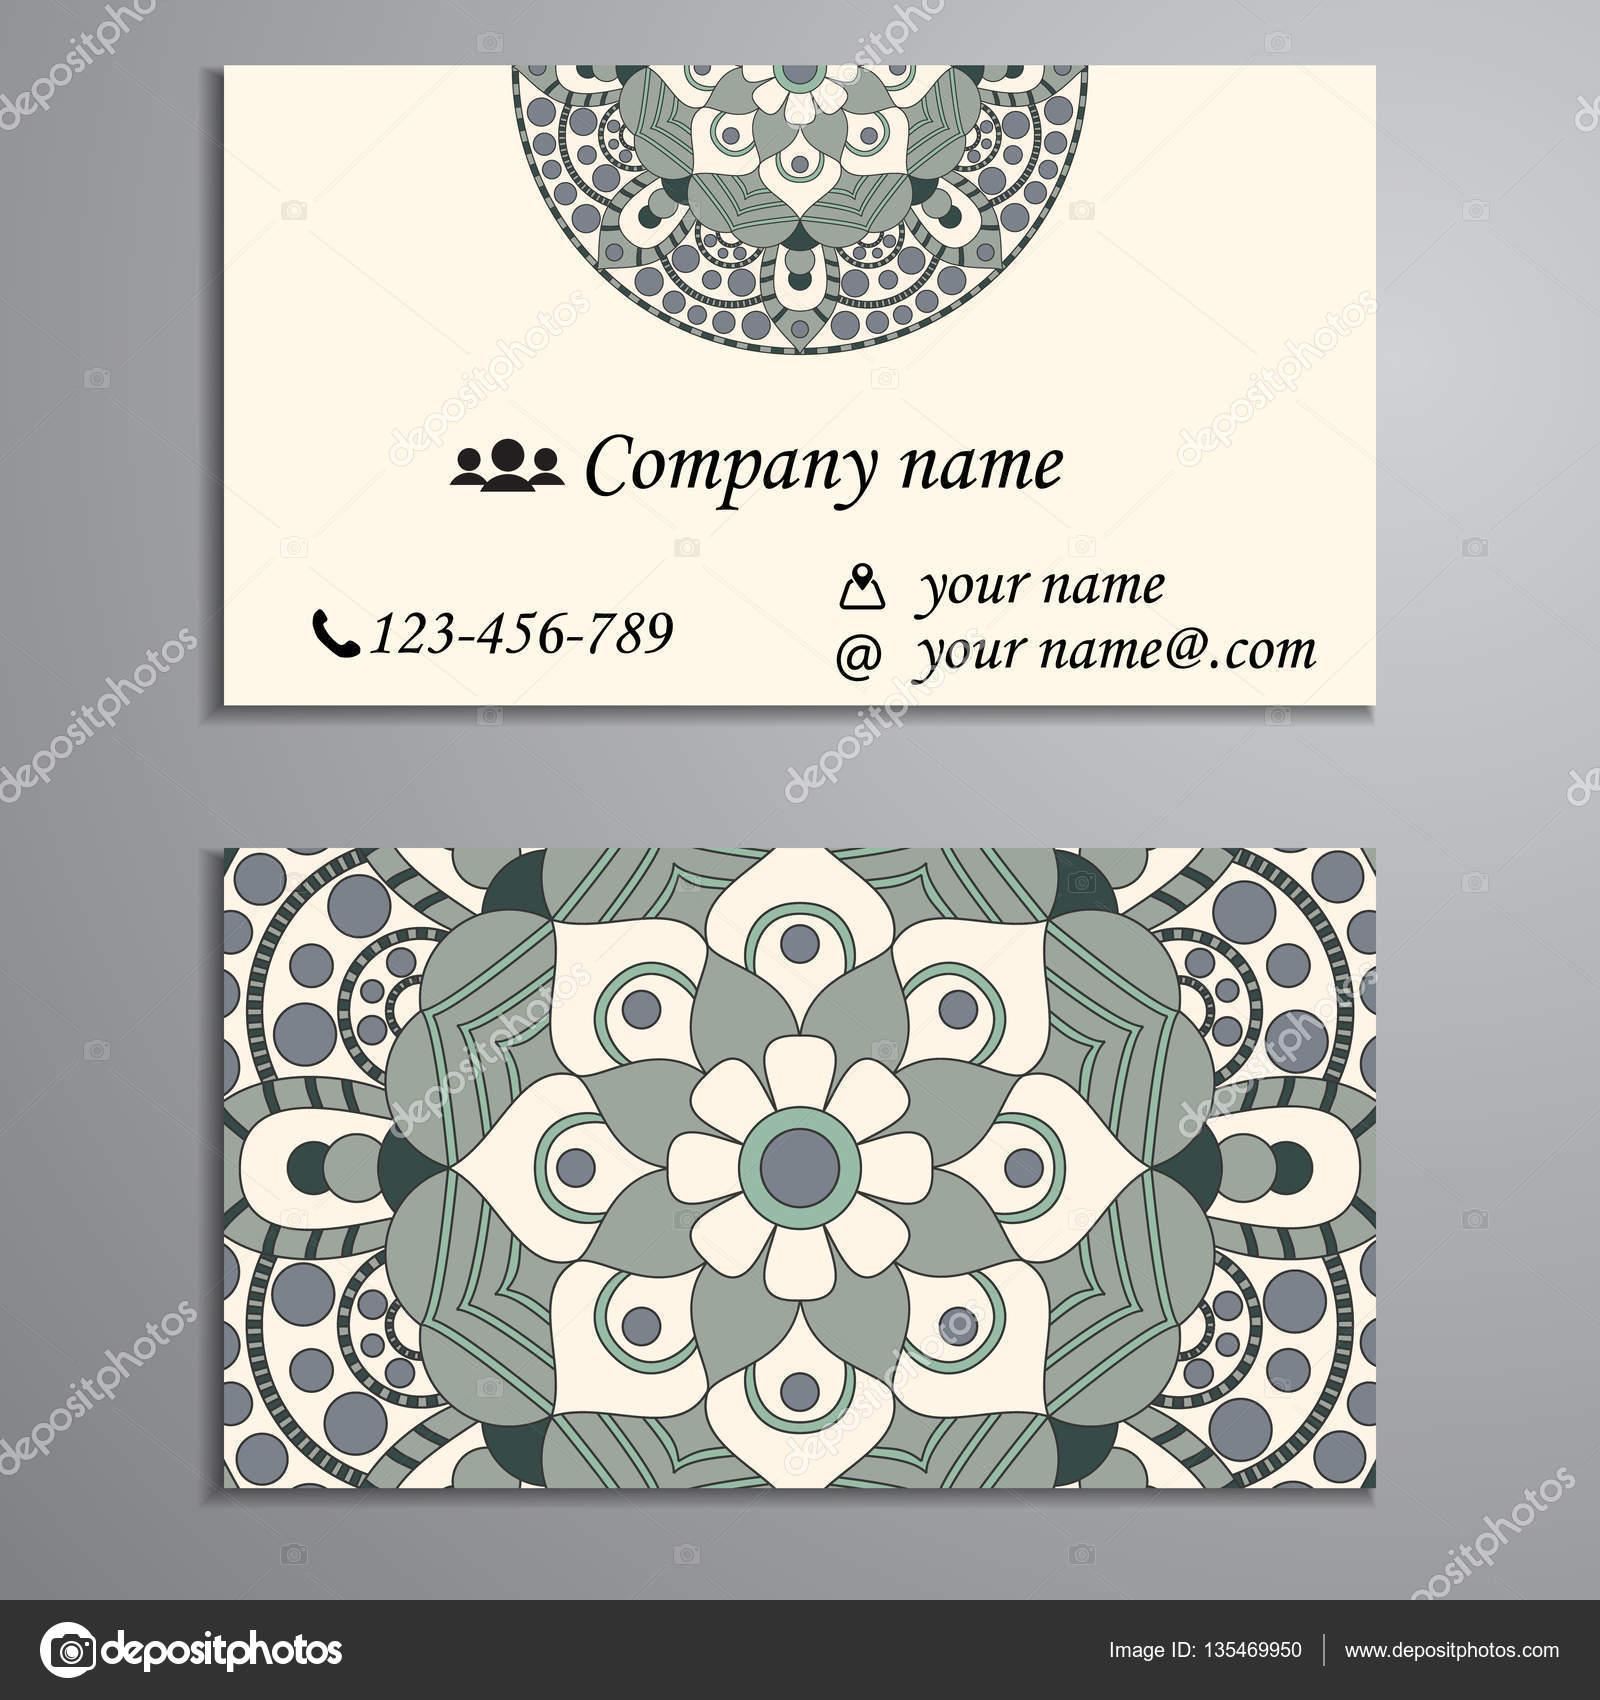 Invitación, tarjeta de visita o banner con plantilla de texto. Ronda ...